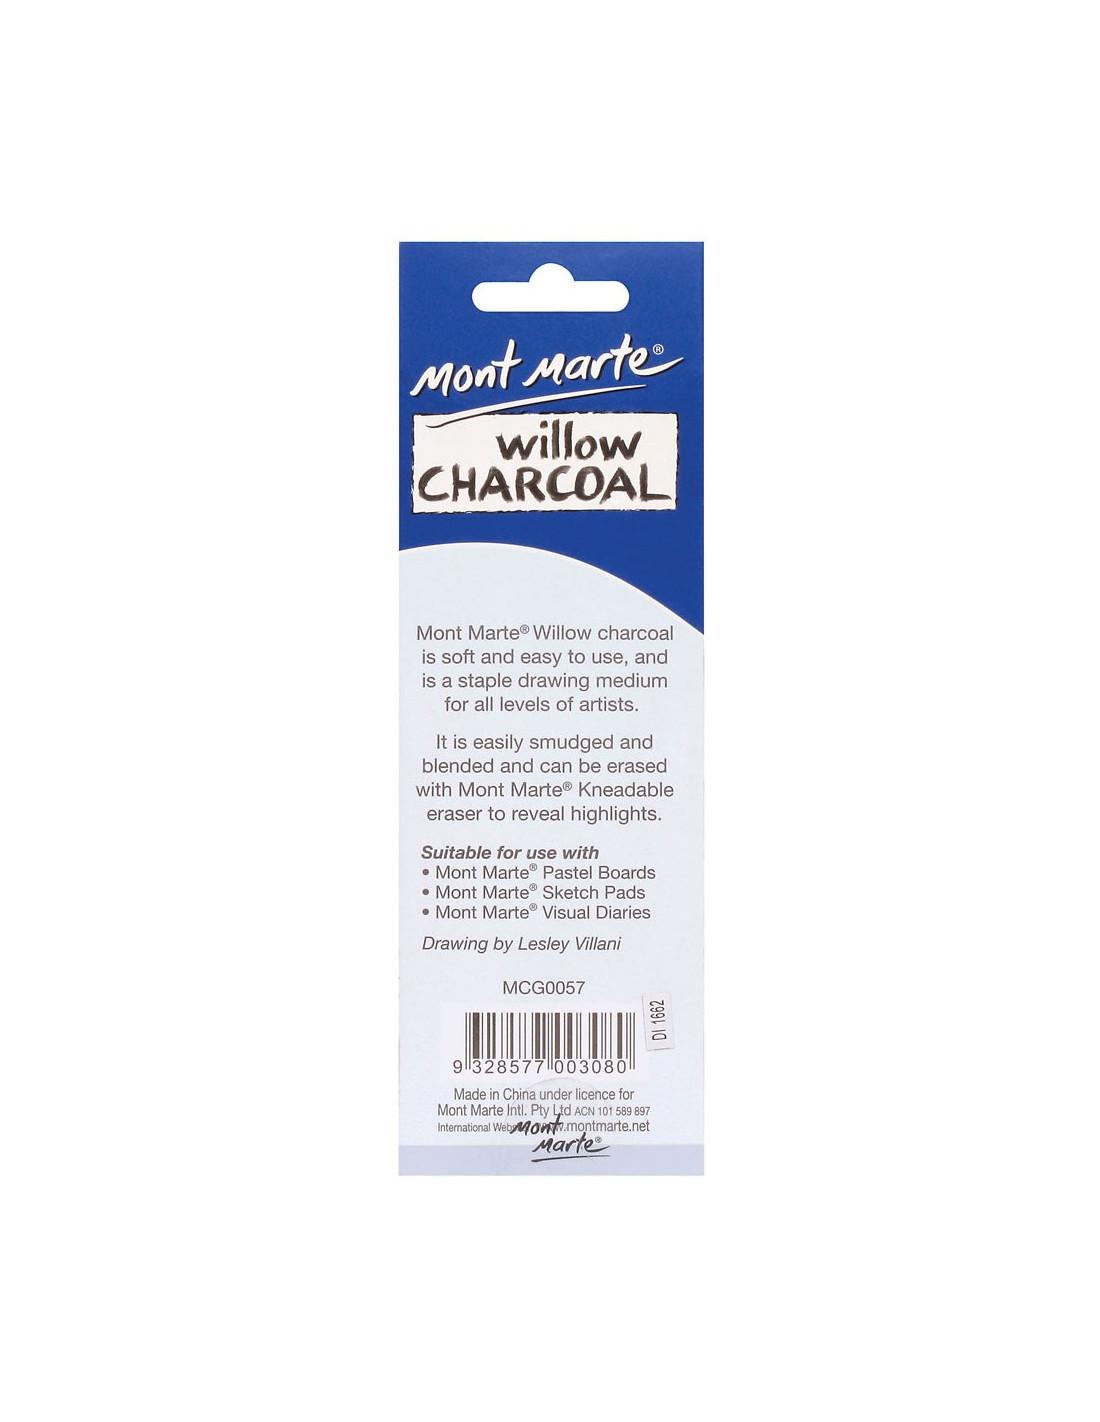 Mont Marte Willow Charcoal (12pcs) - MCG0057